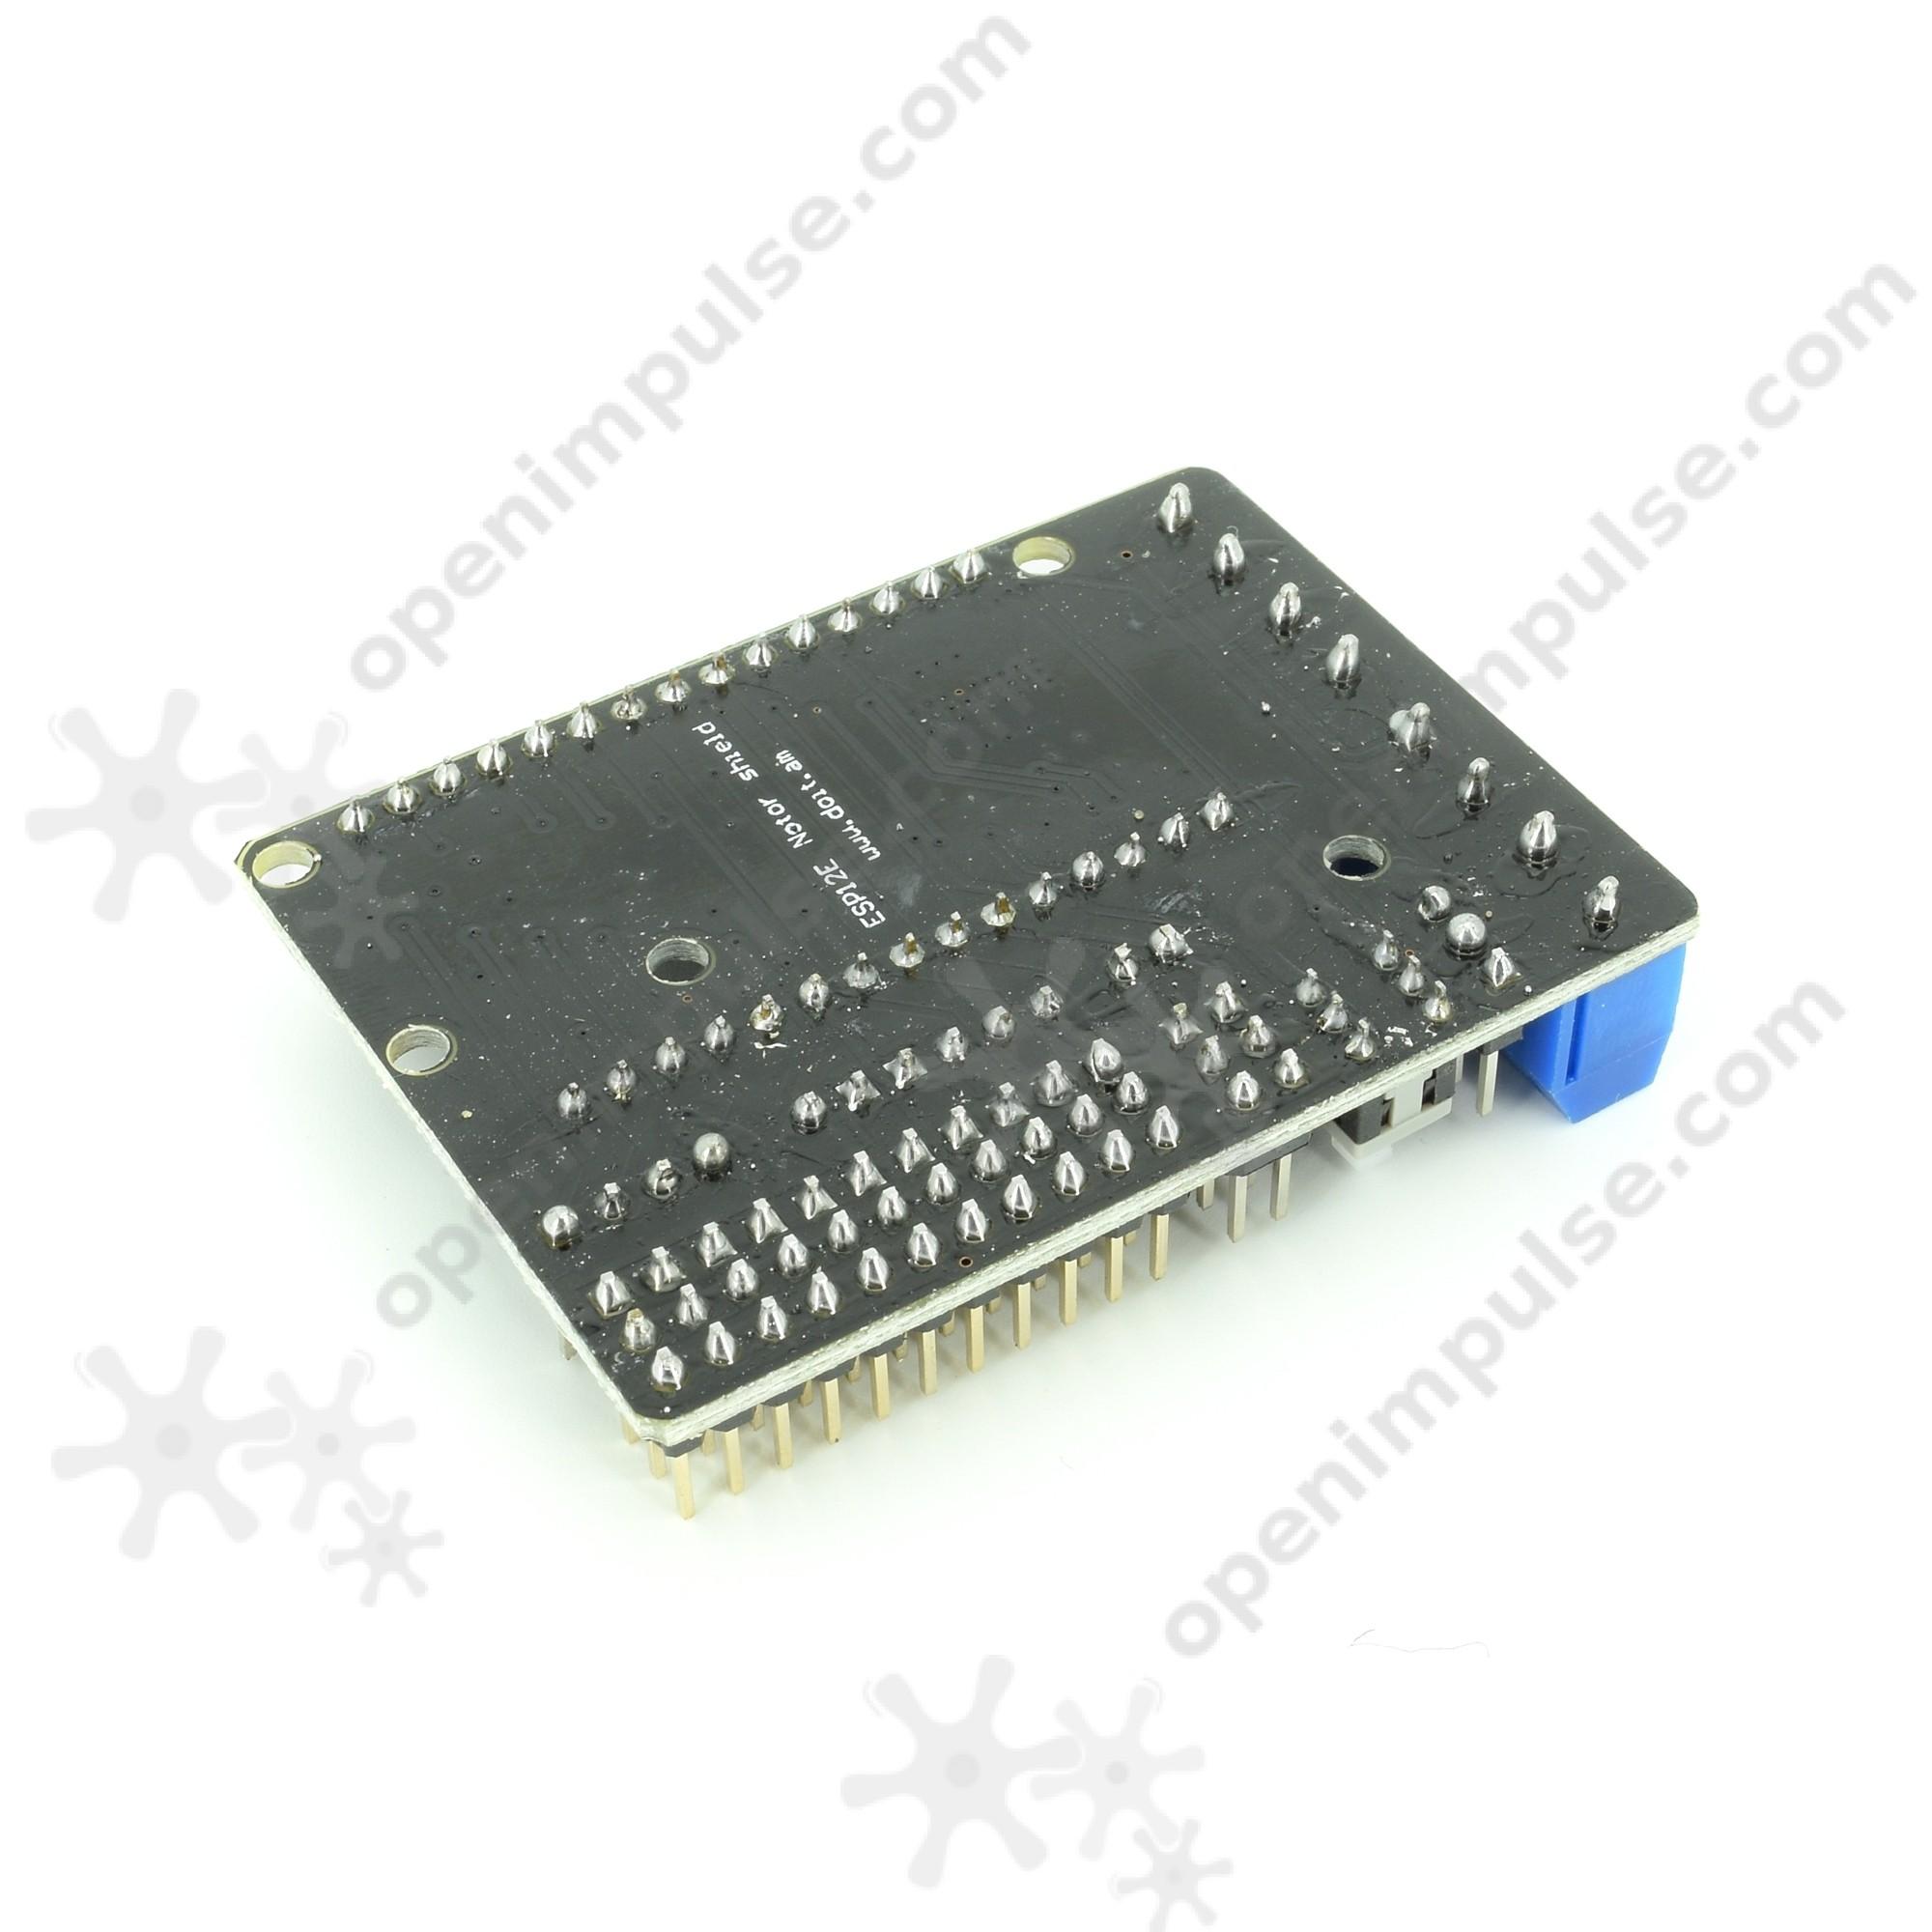 L293d Motor Driver Board For Esp8266 Wifi Modules Open Impulseopen Circuit